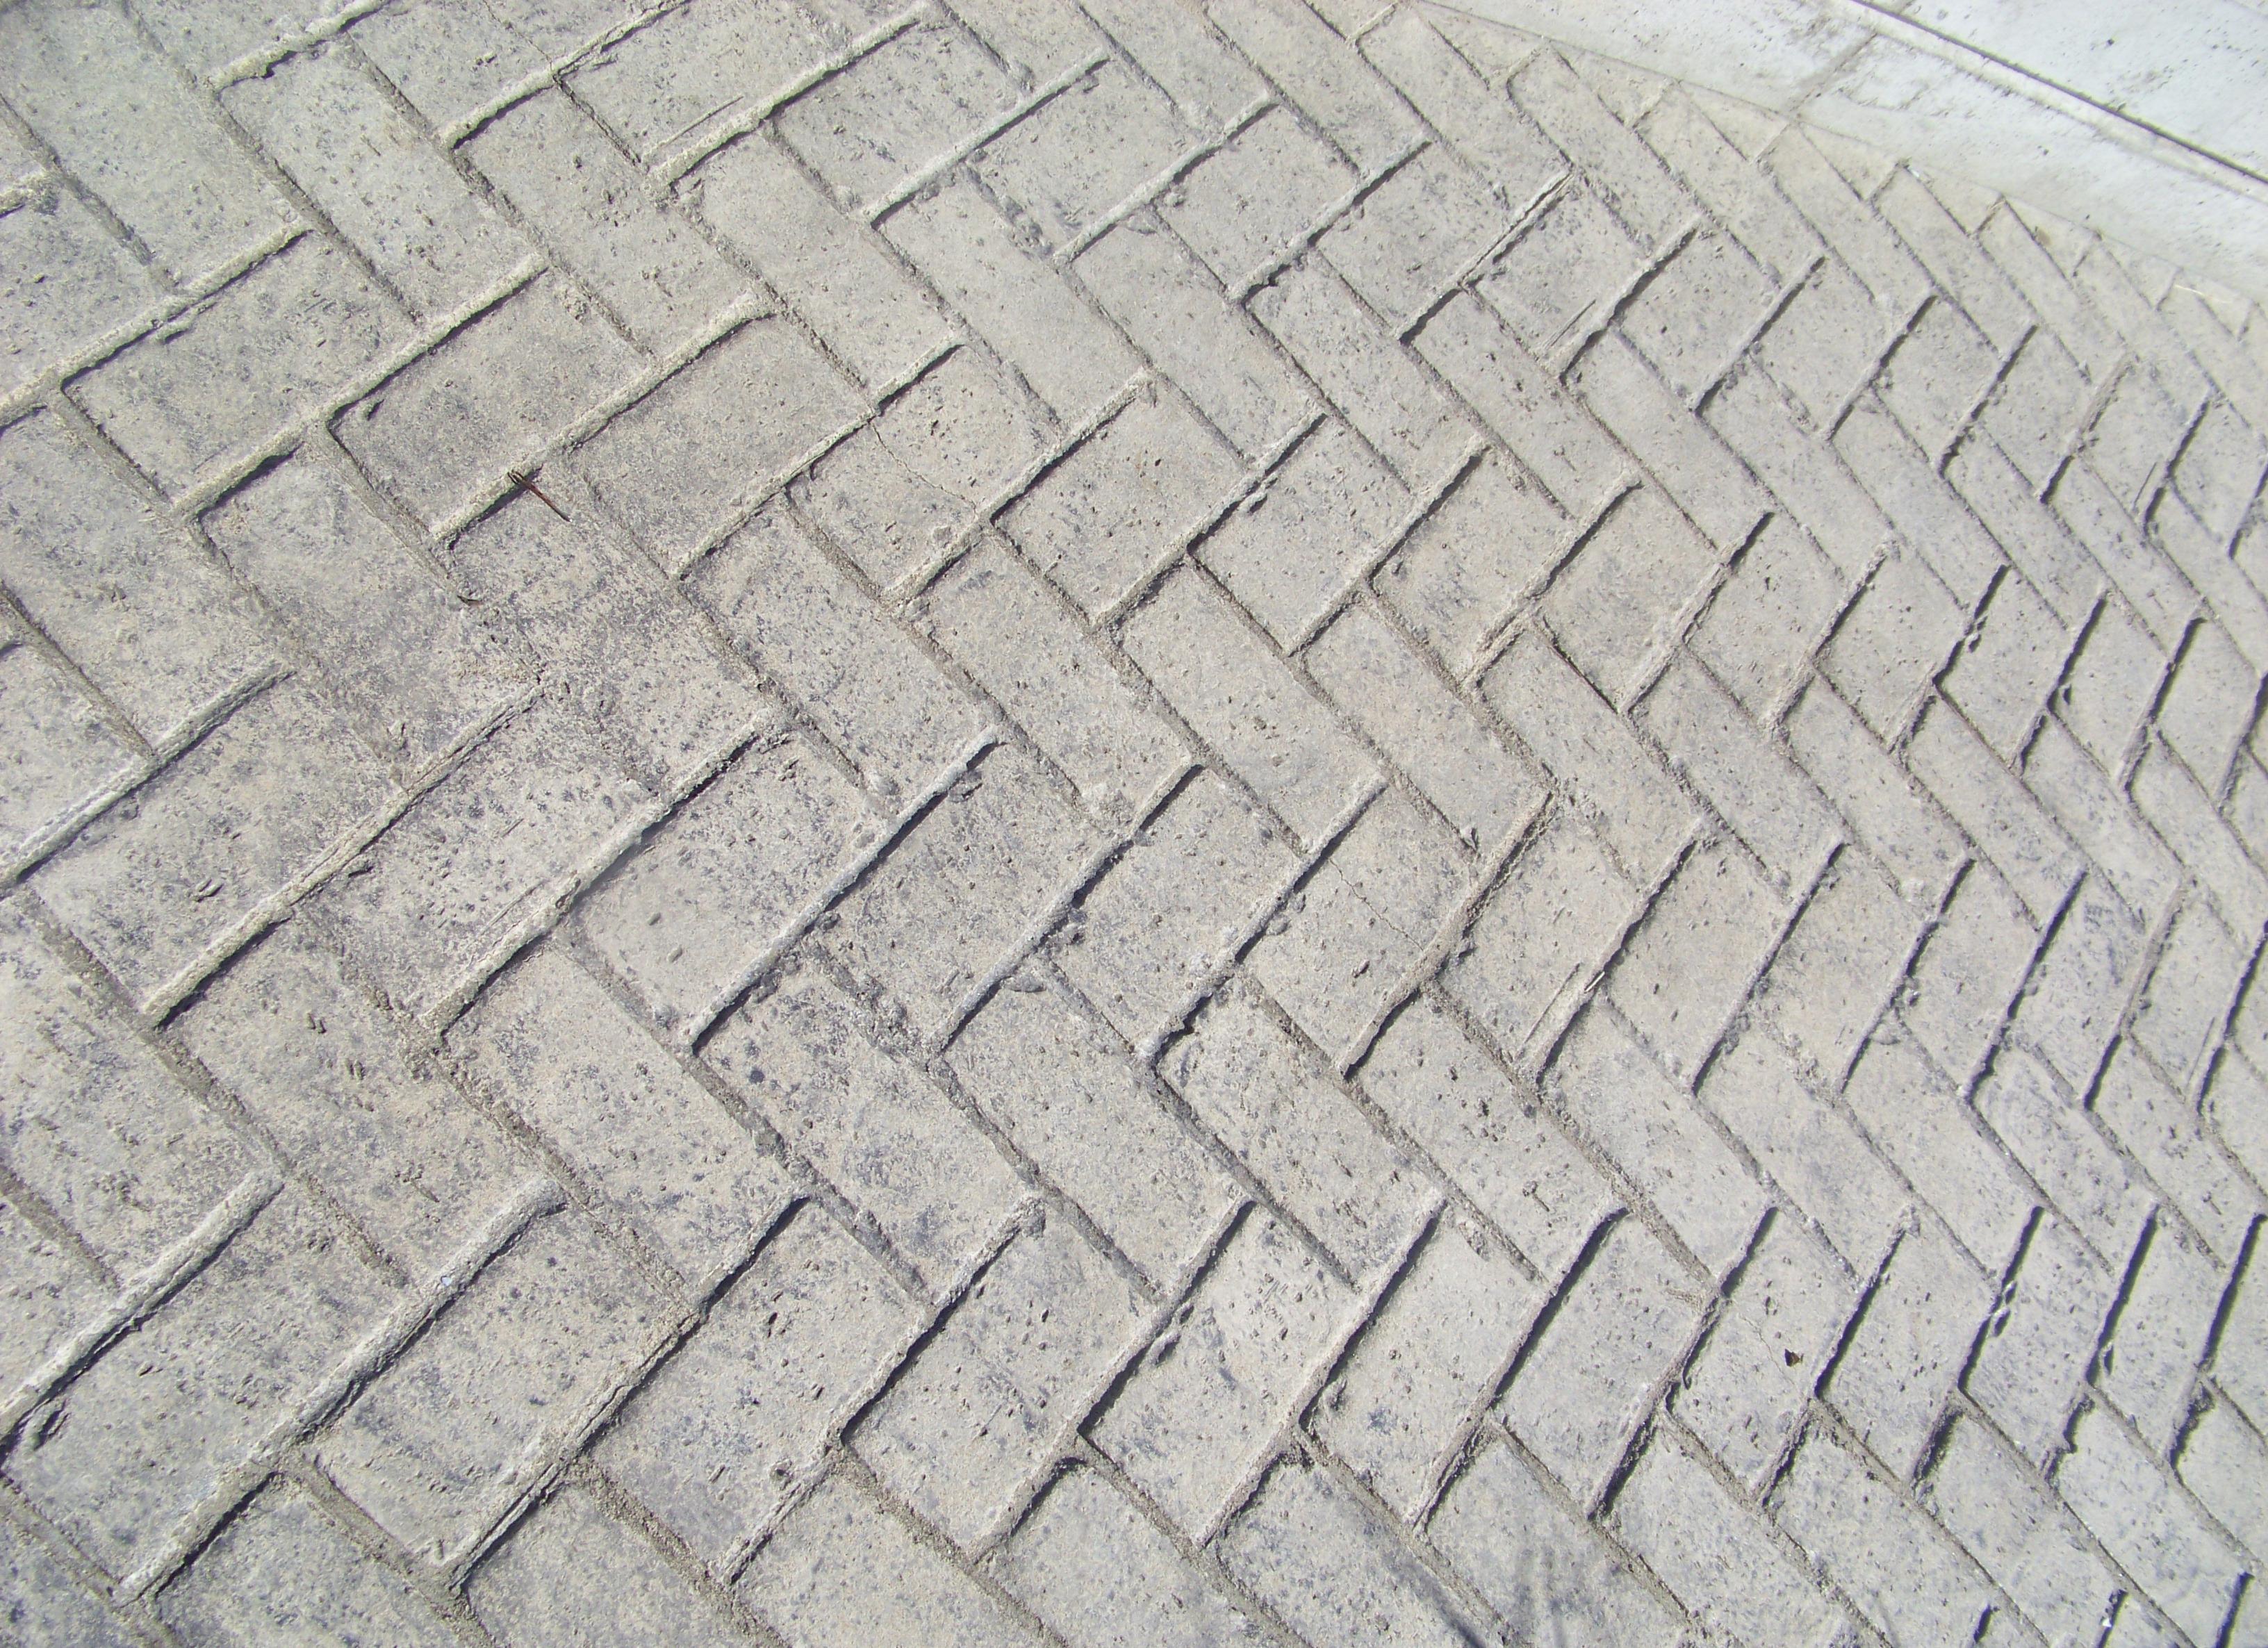 fotos gratis estructura suelo acera piso techo guijarro asfalto gris exterior ladrillo material neumtico hormign lneas fondo cemento